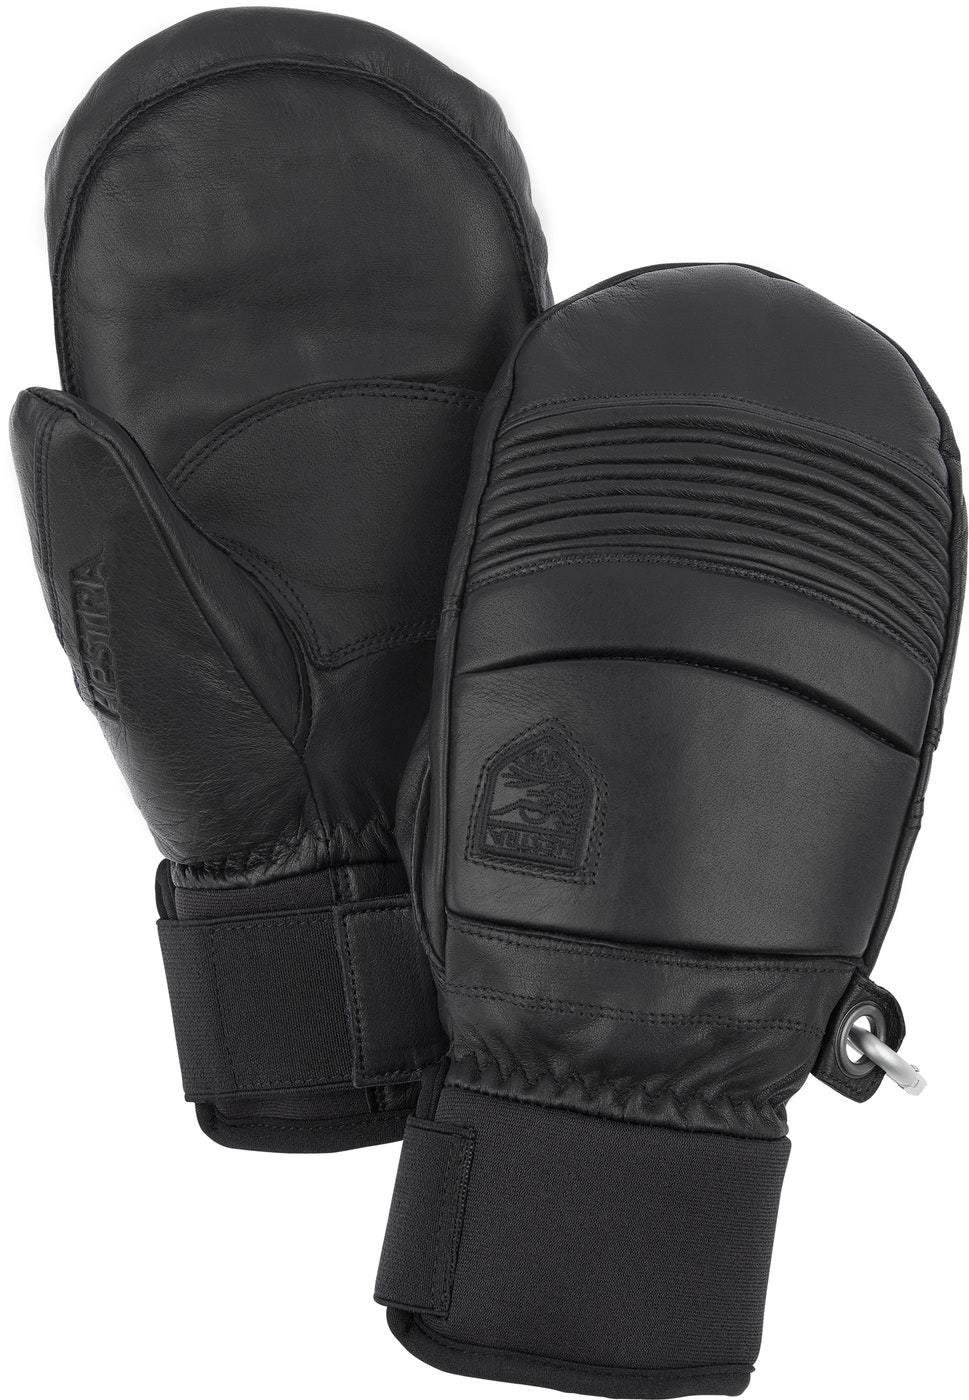 Leather Fall LIne Mitt - 31471-100